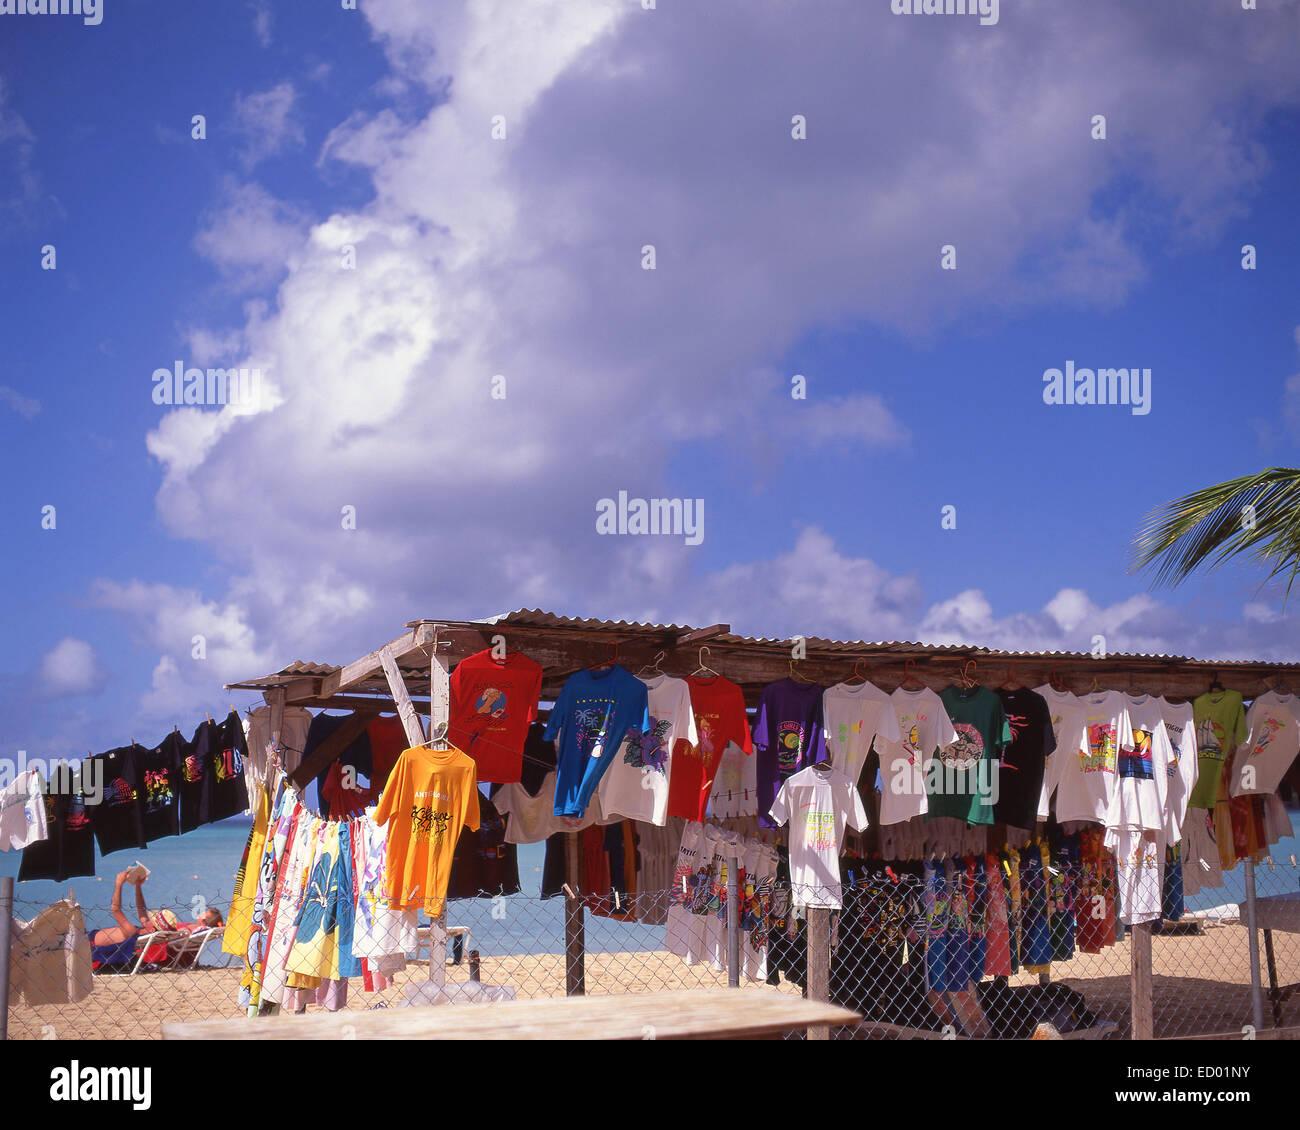 Beach clothing stall, Jolly Beach Resort & Spa, Saint Mary's Parish, Antigua, Antigua and Barbuda, Lesser Antilles, - Stock Image